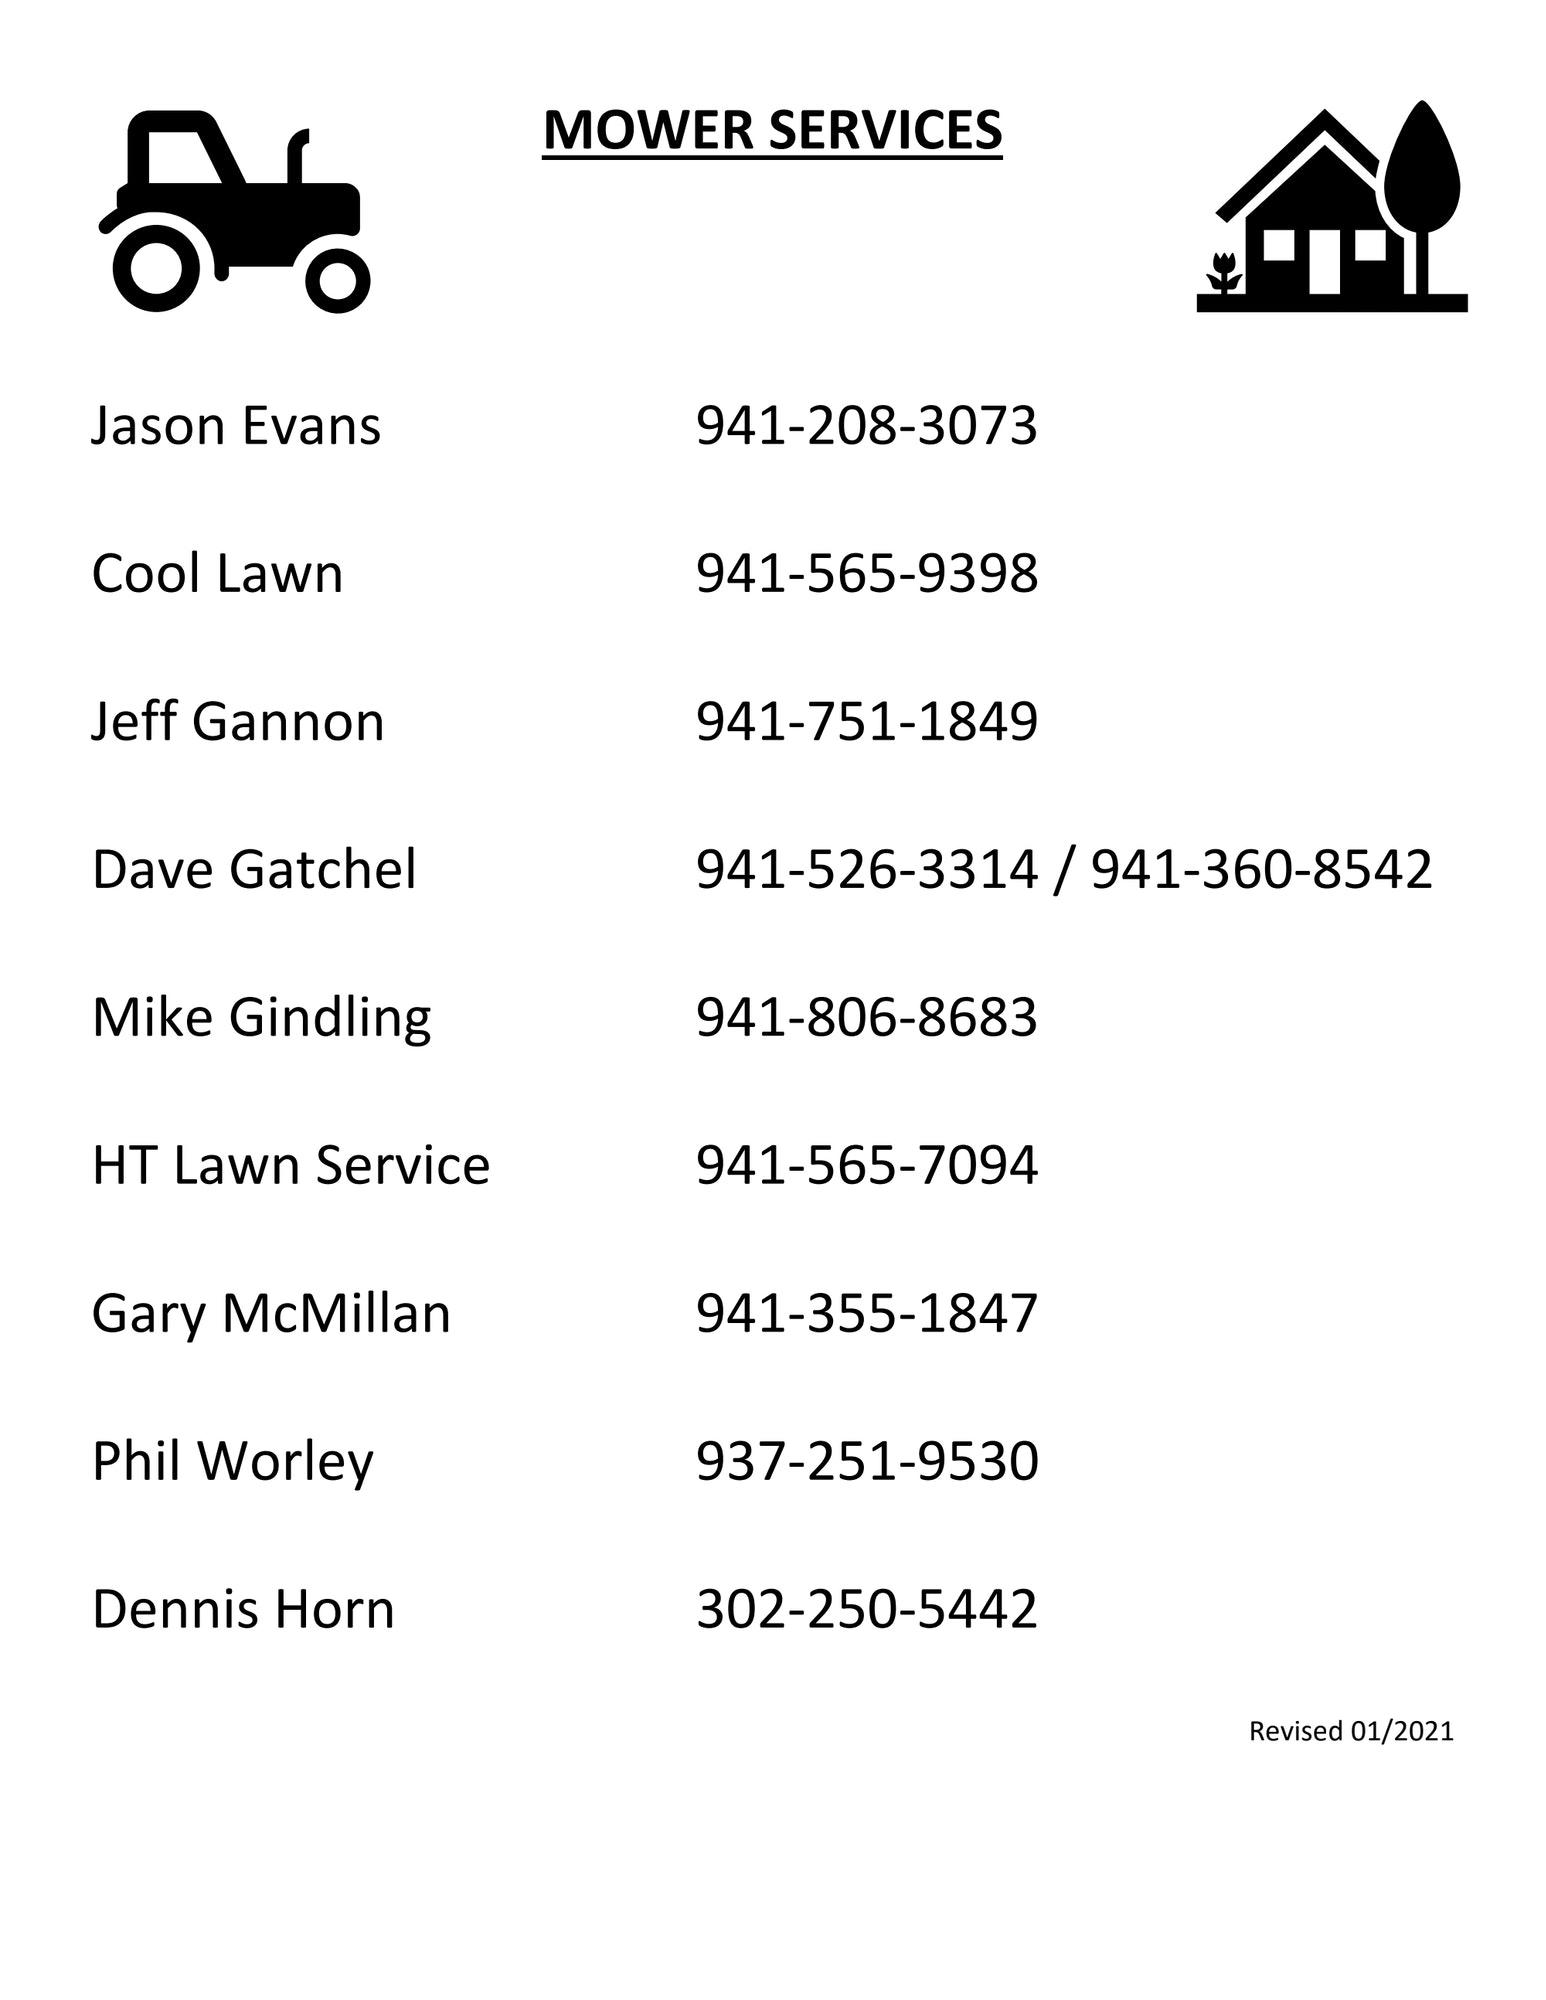 mower services in tri par